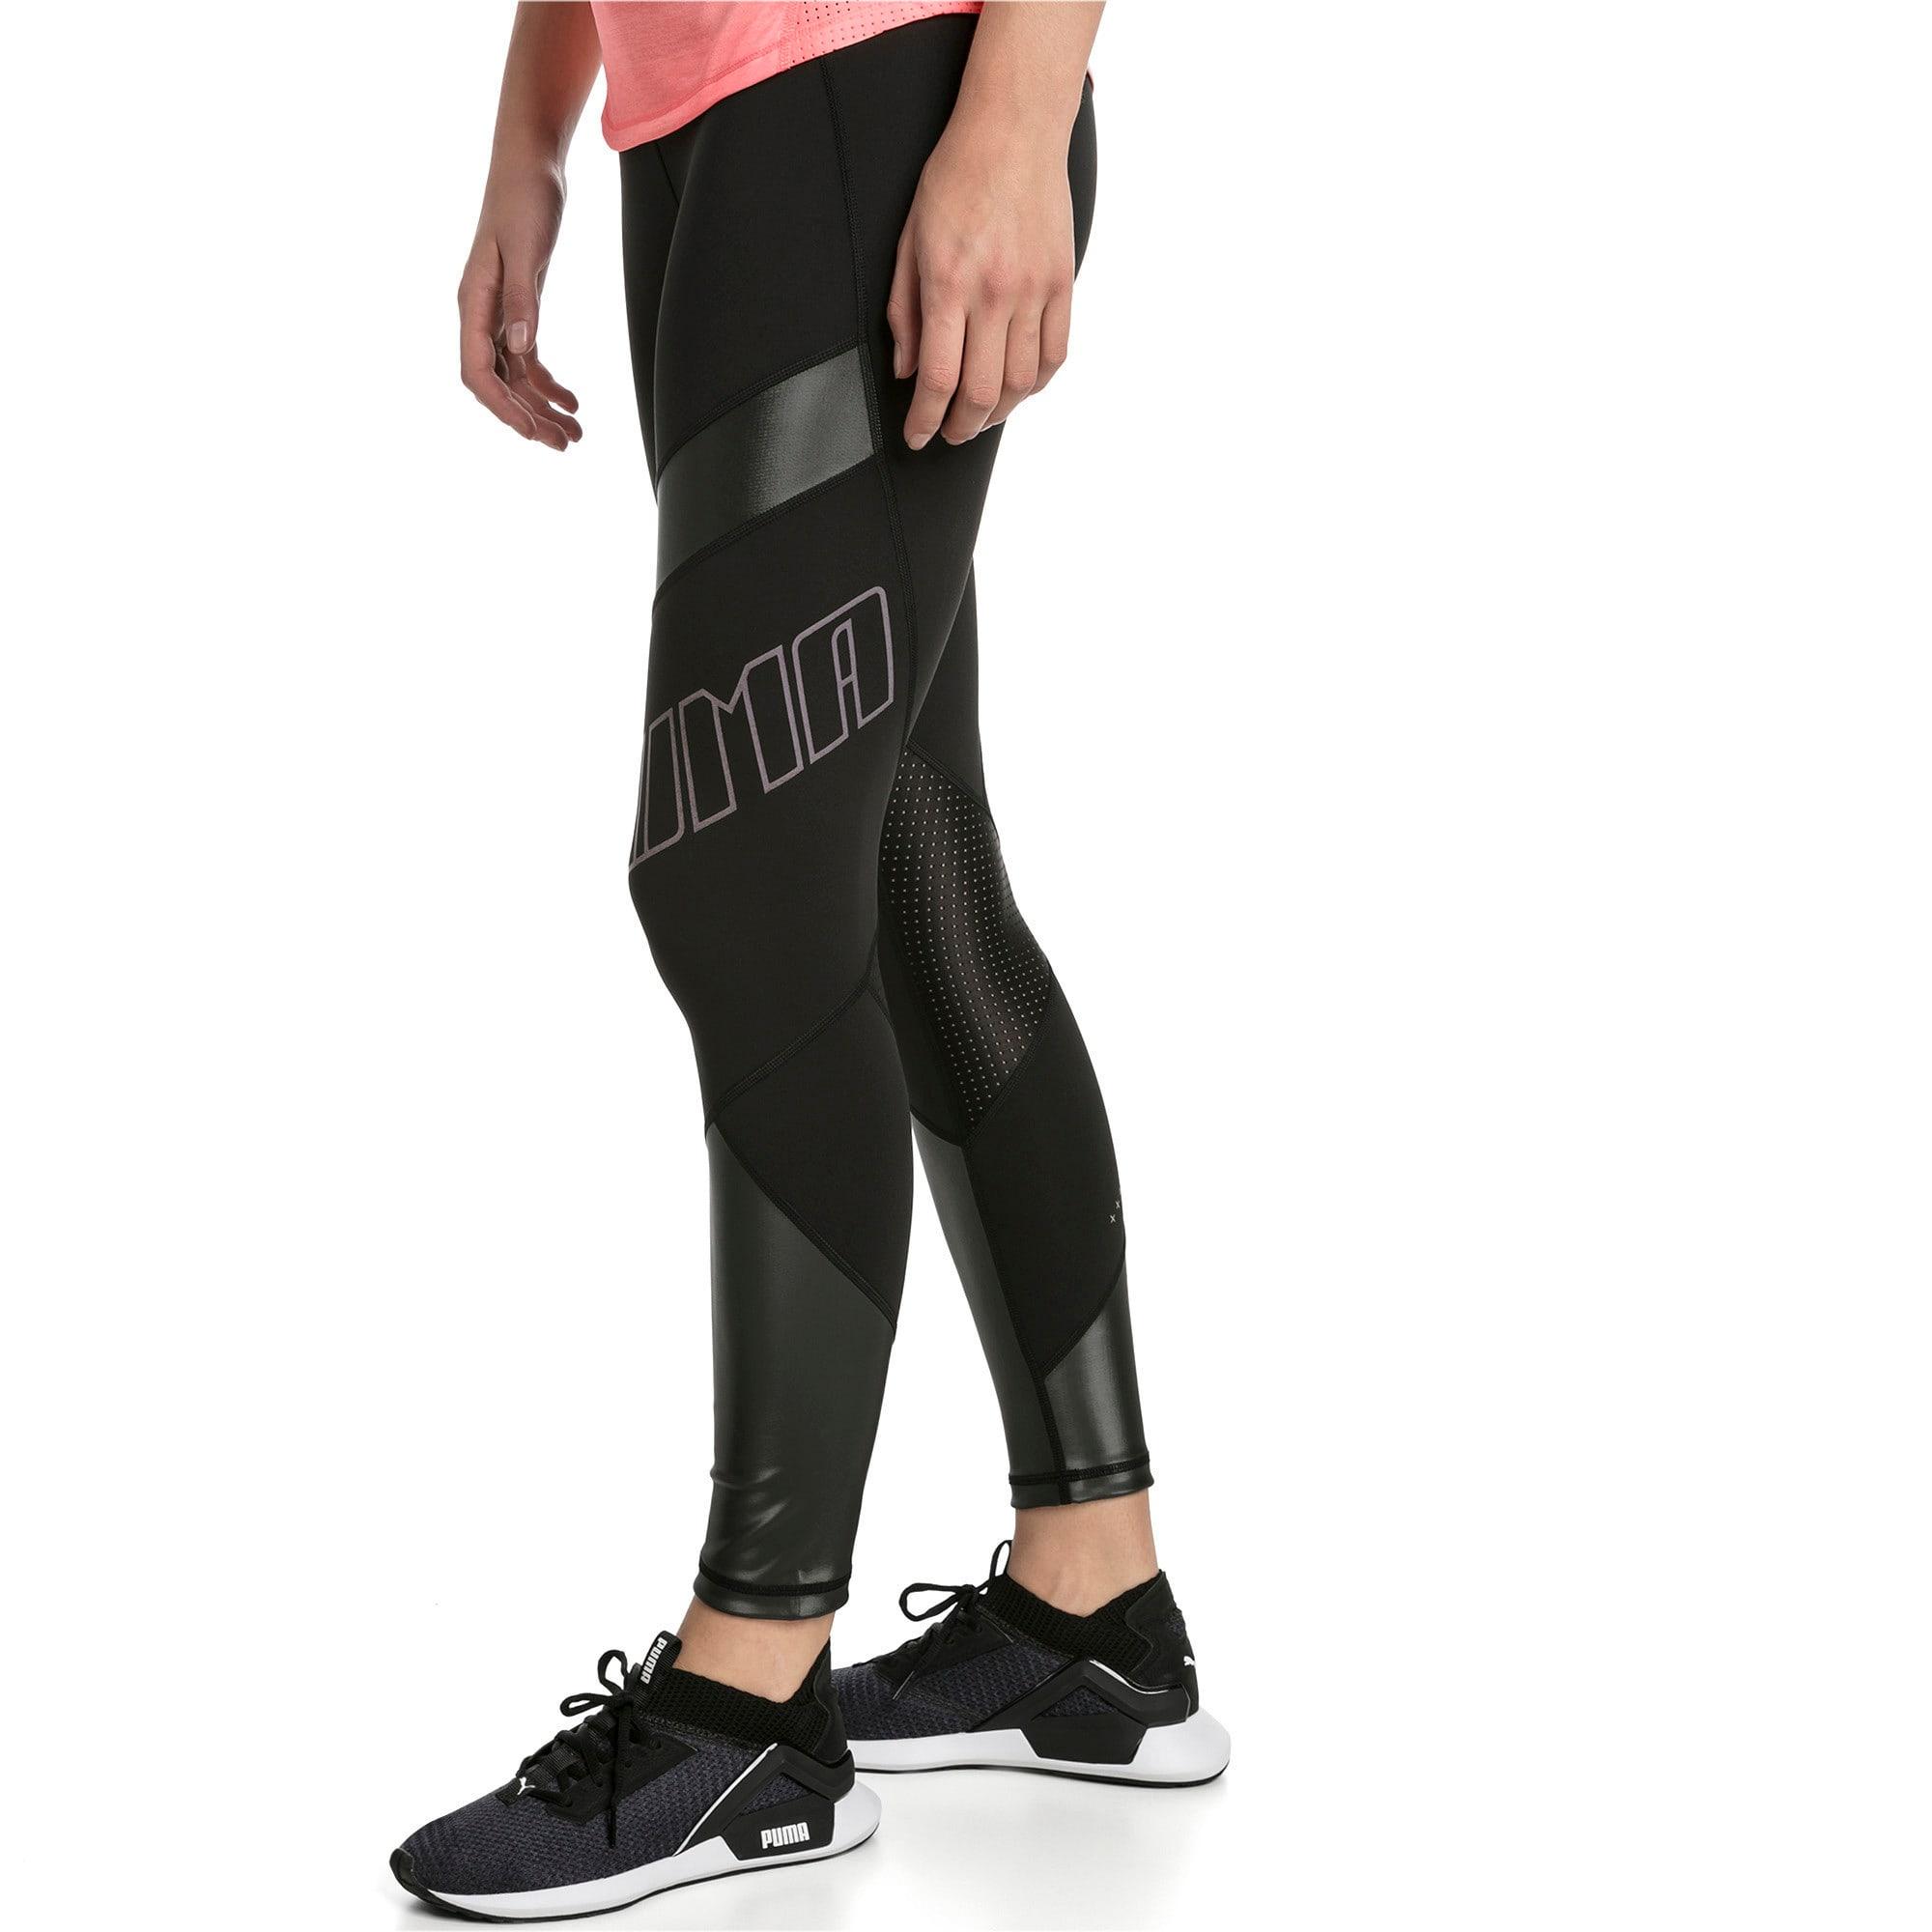 Thumbnail 1 of Elite Women's Running Leggings, Puma Black, medium-IND